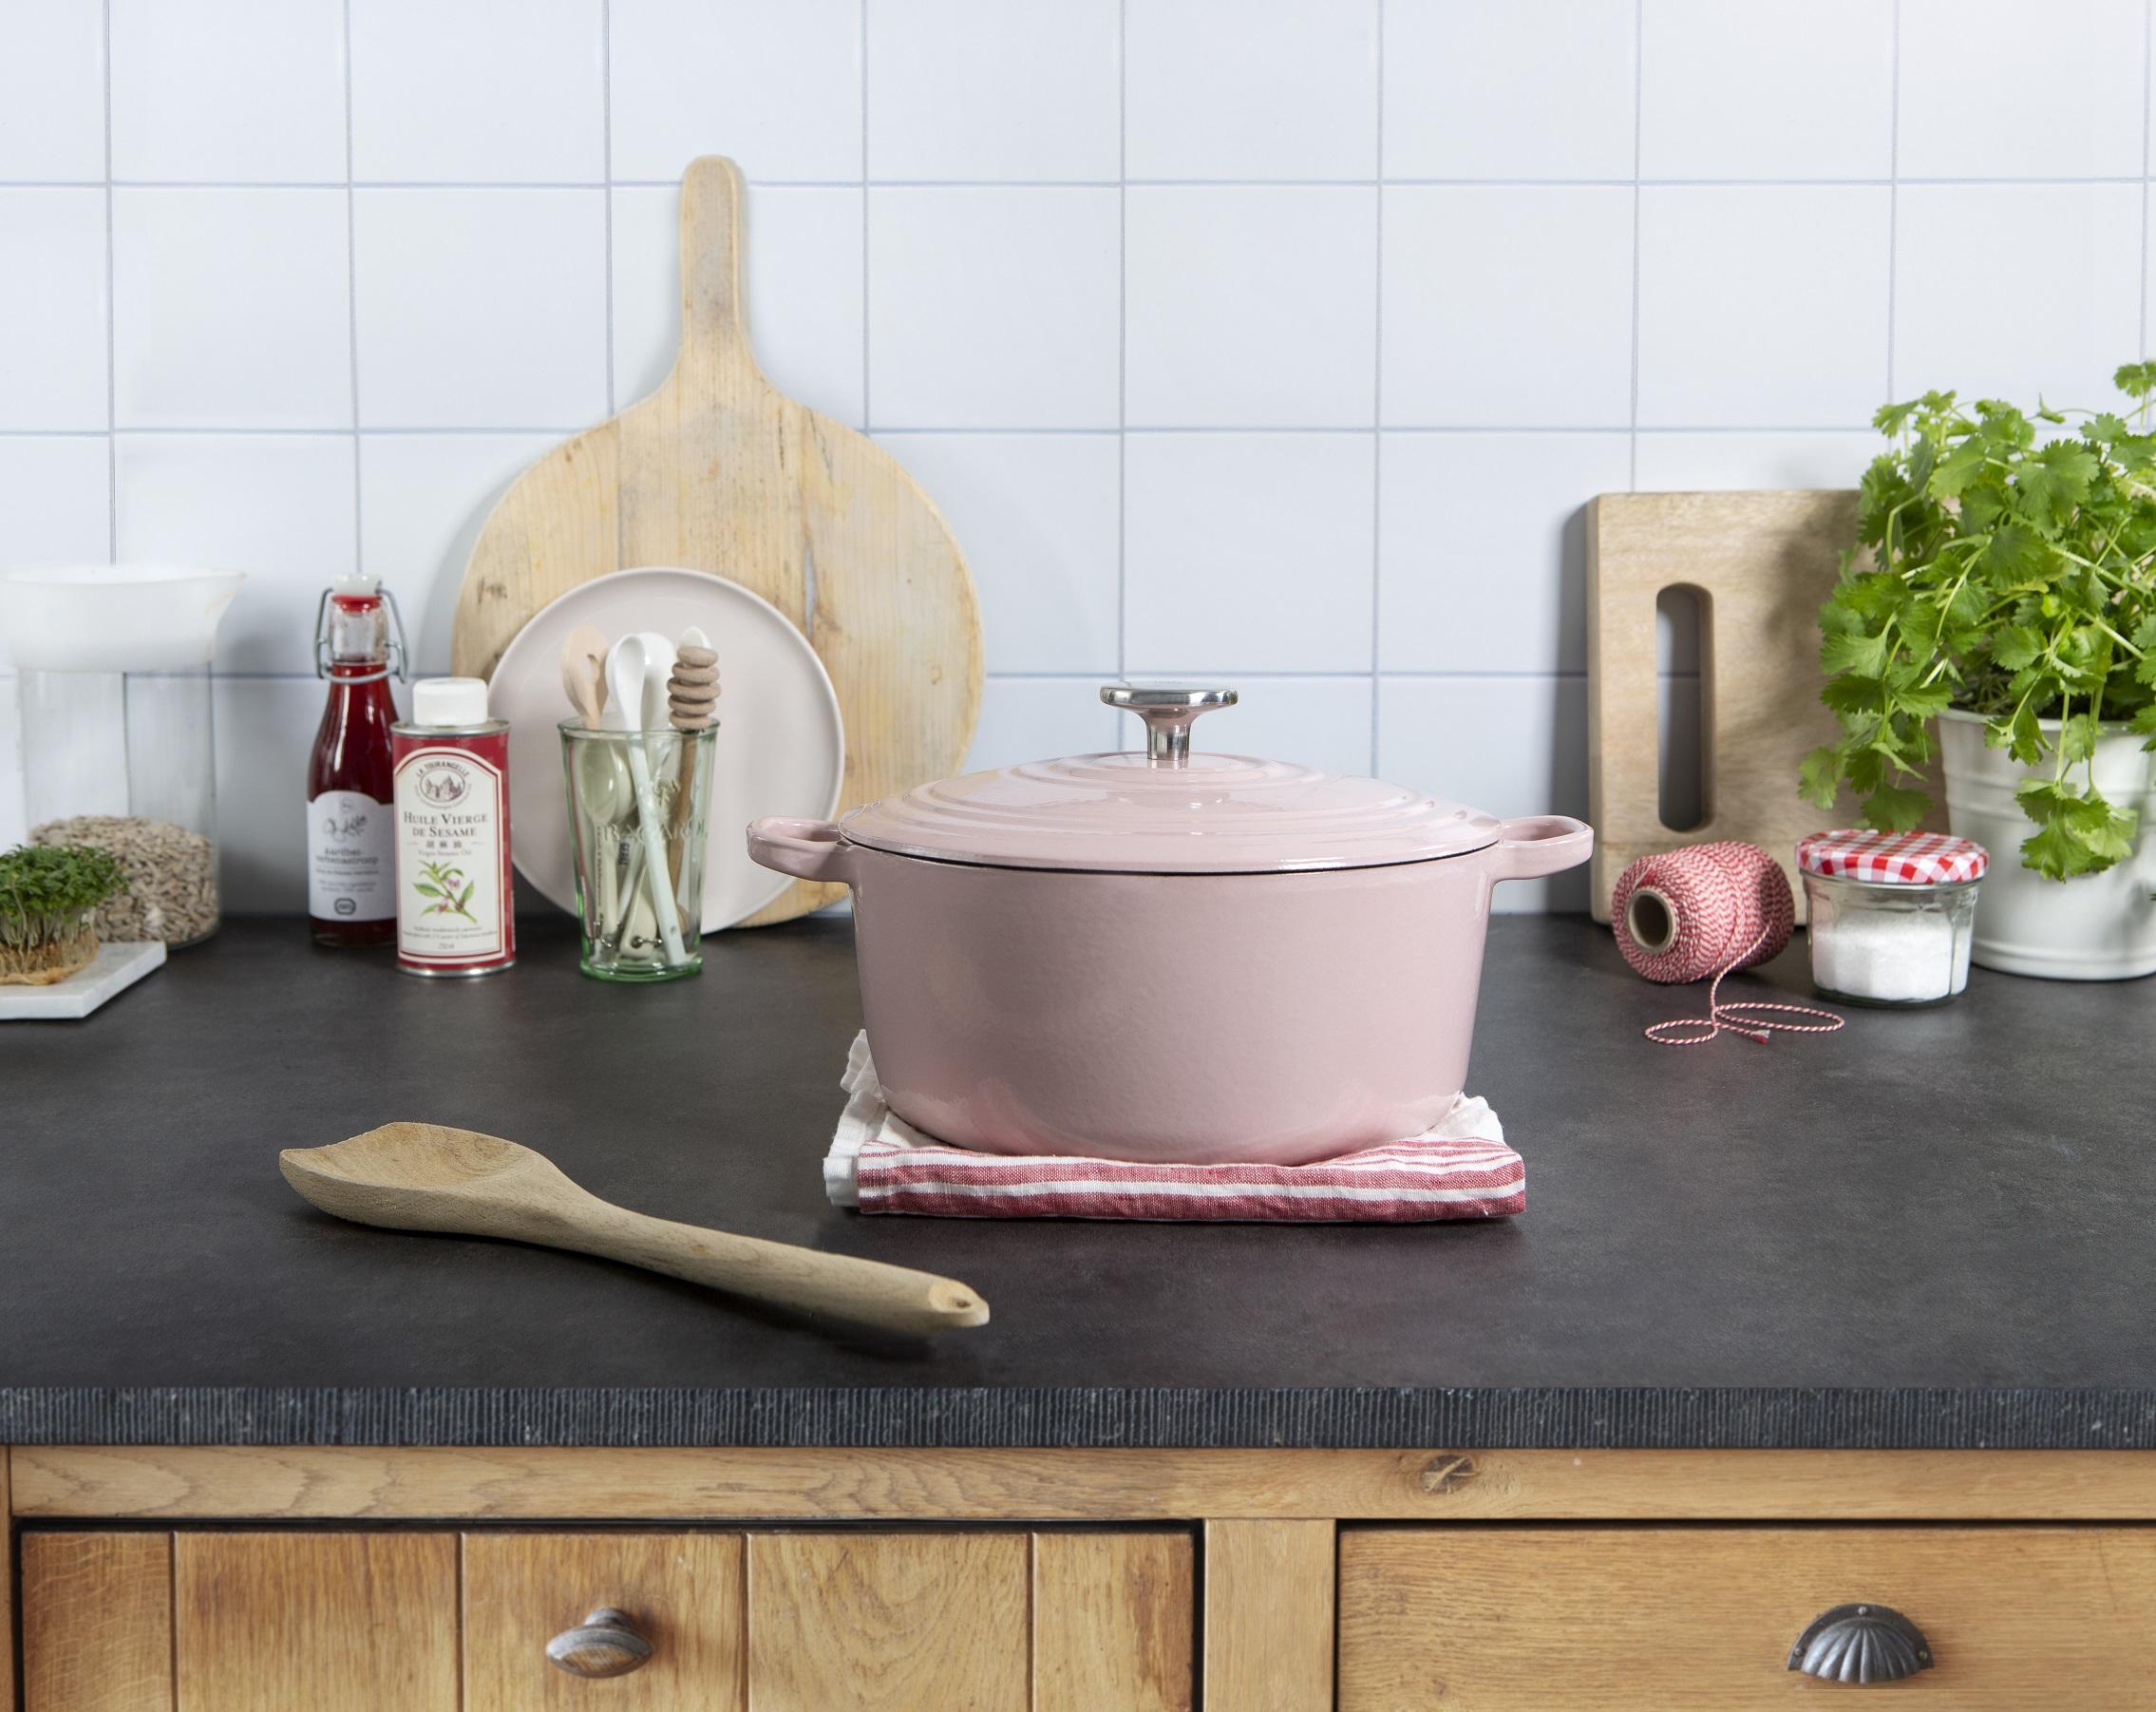 WIN: Roze keukenprinsessenpan van BK t.w.v. € 89,-